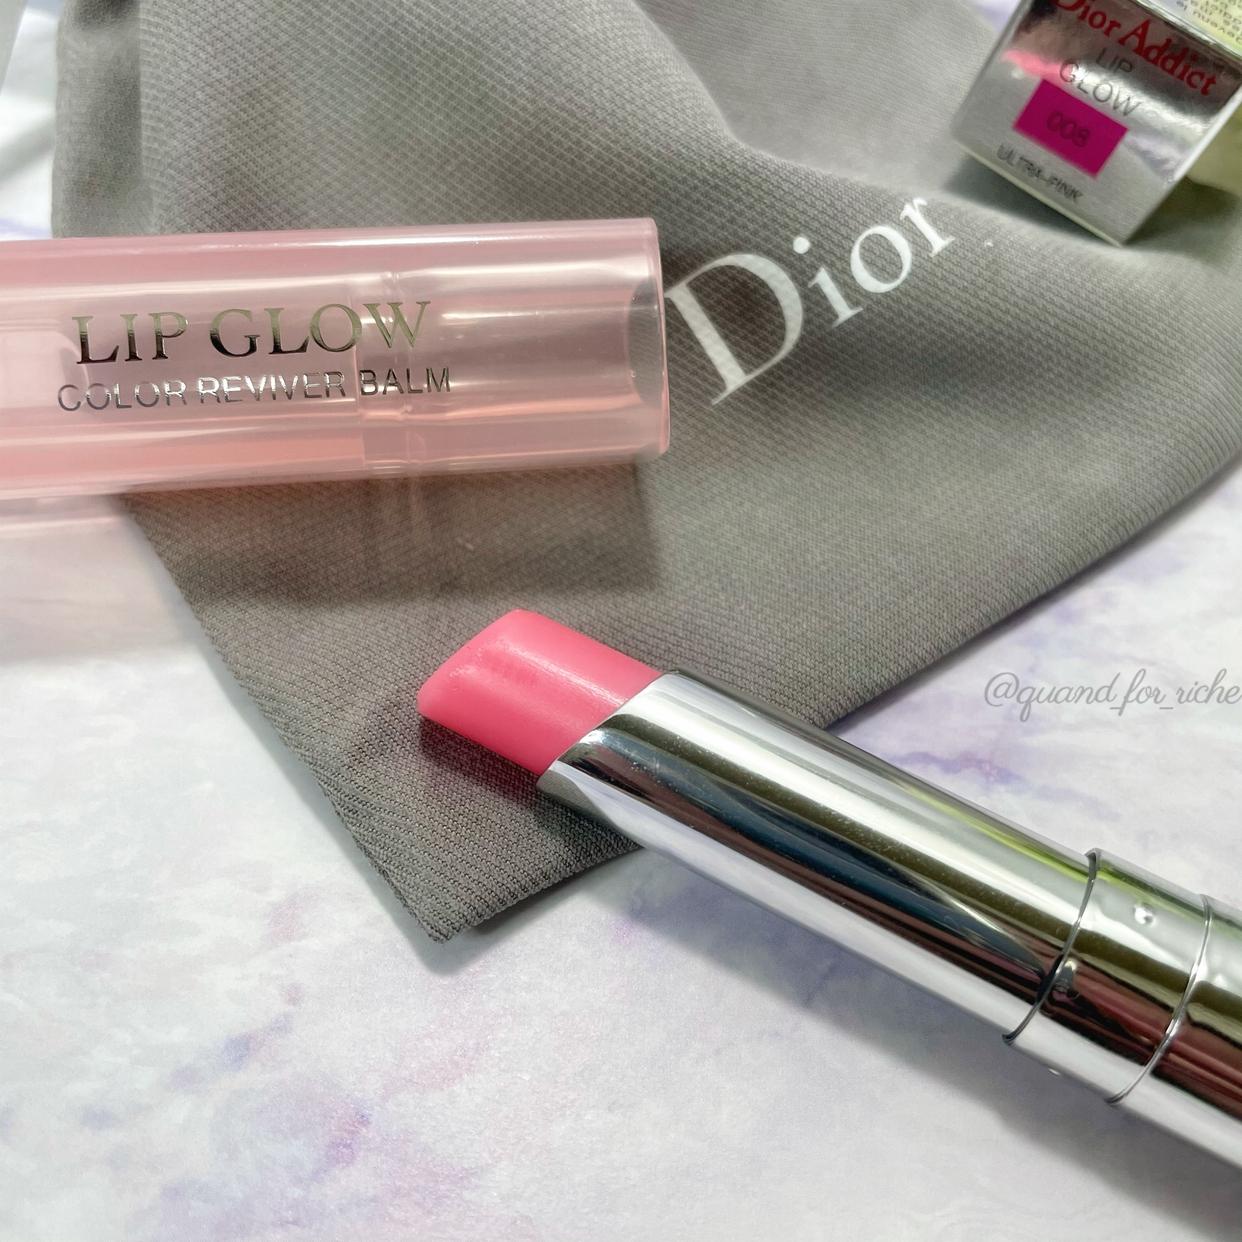 Dior(ディオール)アディクト リップ グロウを使ったきょうこ_りっしゅさんのクチコミ画像